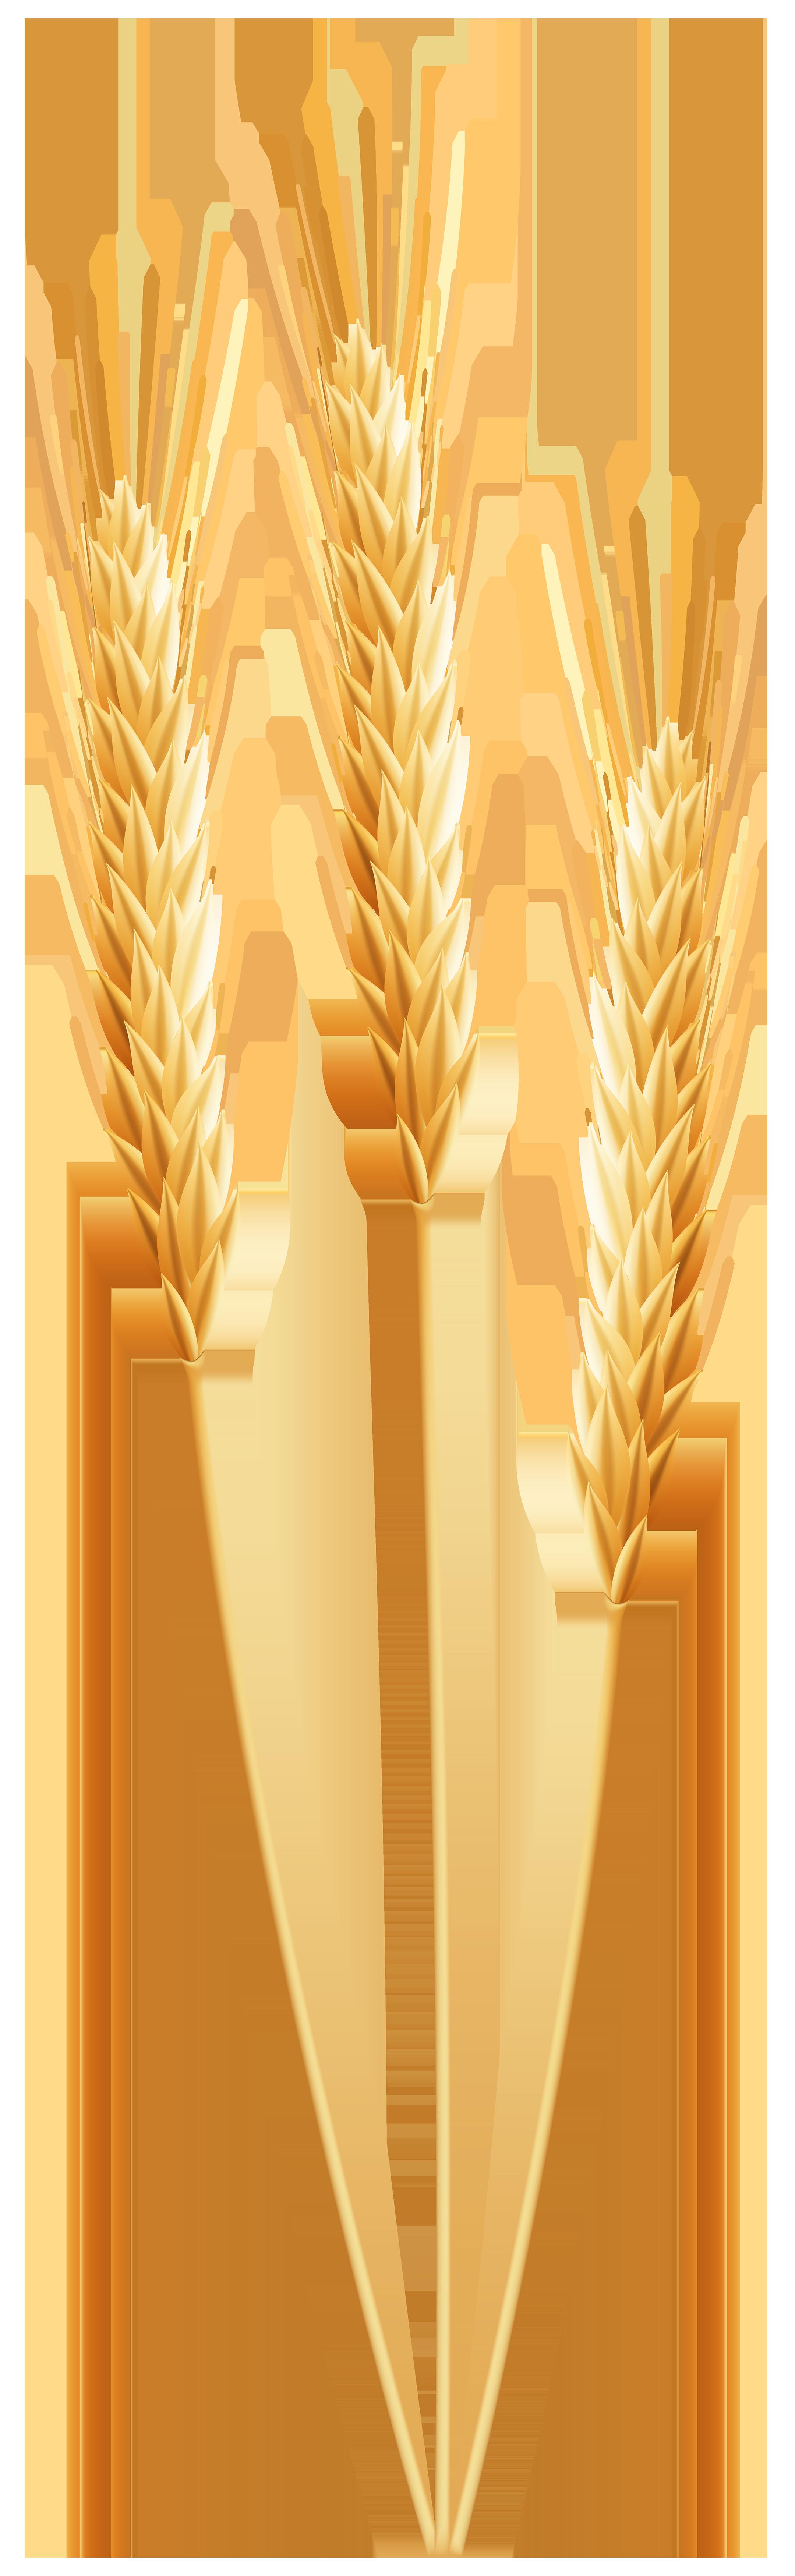 Wheat clipart bushel wheat. Png clip art image